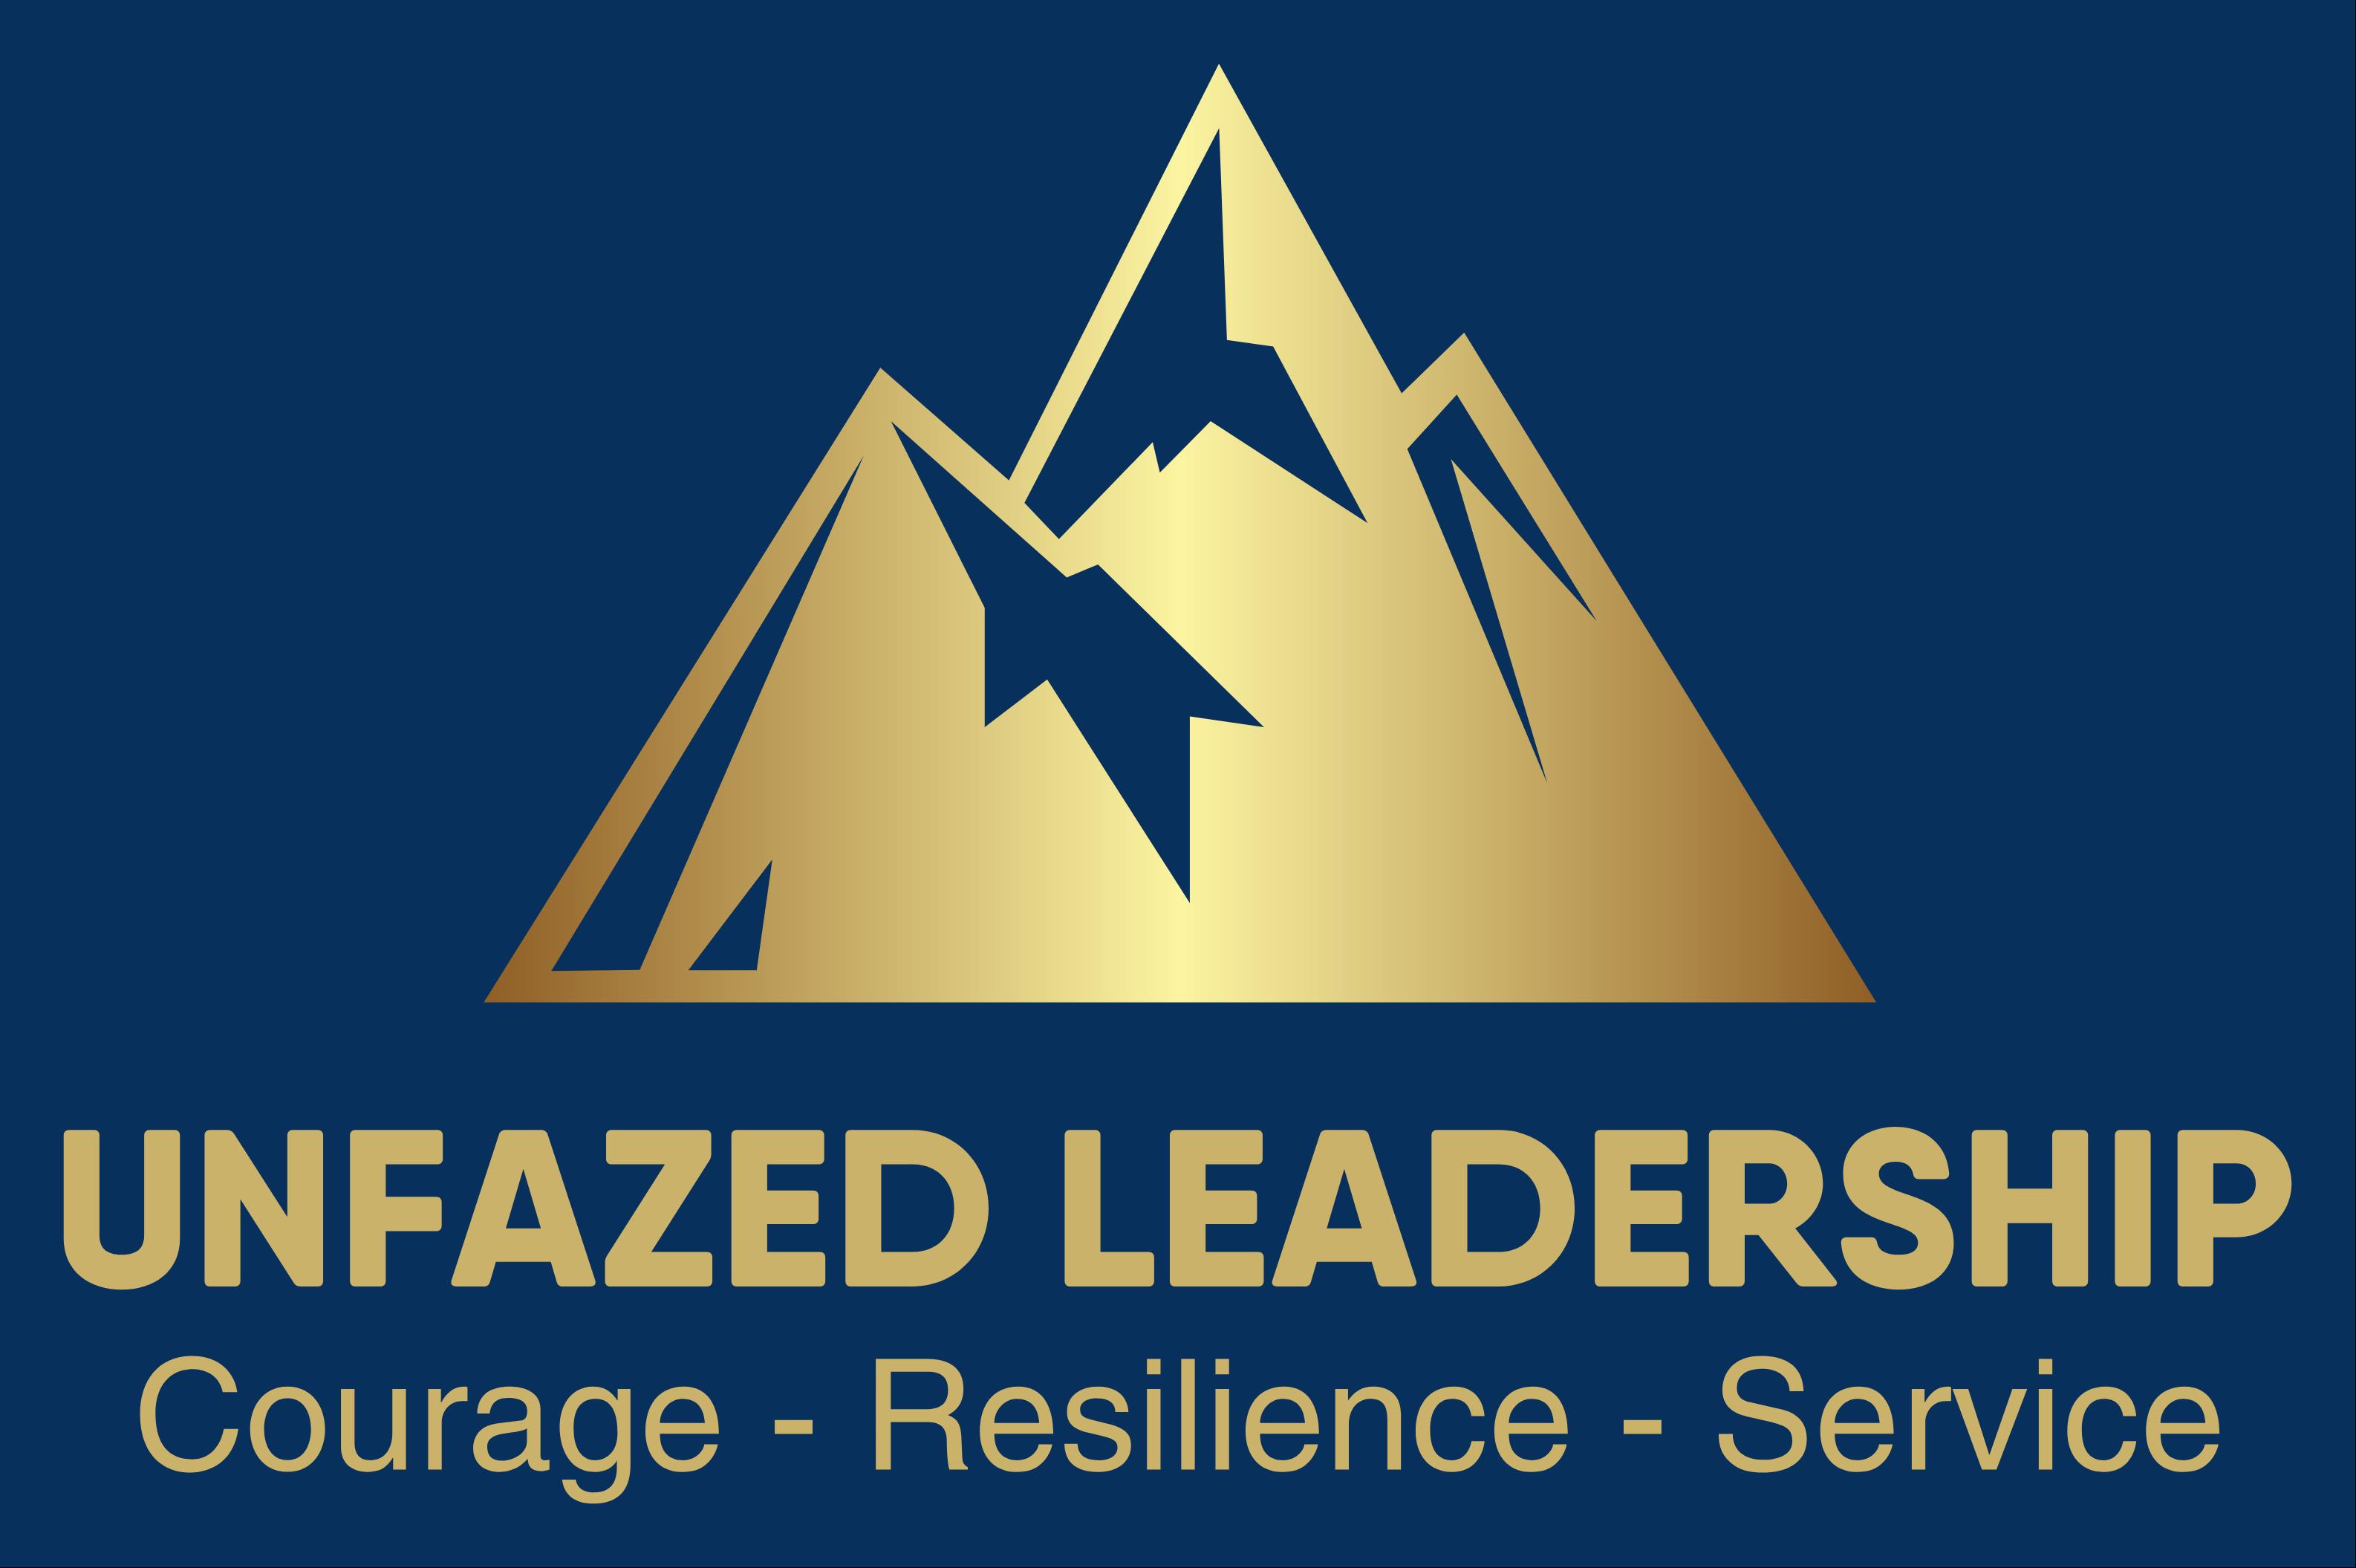 Ed O'Neal – Unfazed Leadership LLC